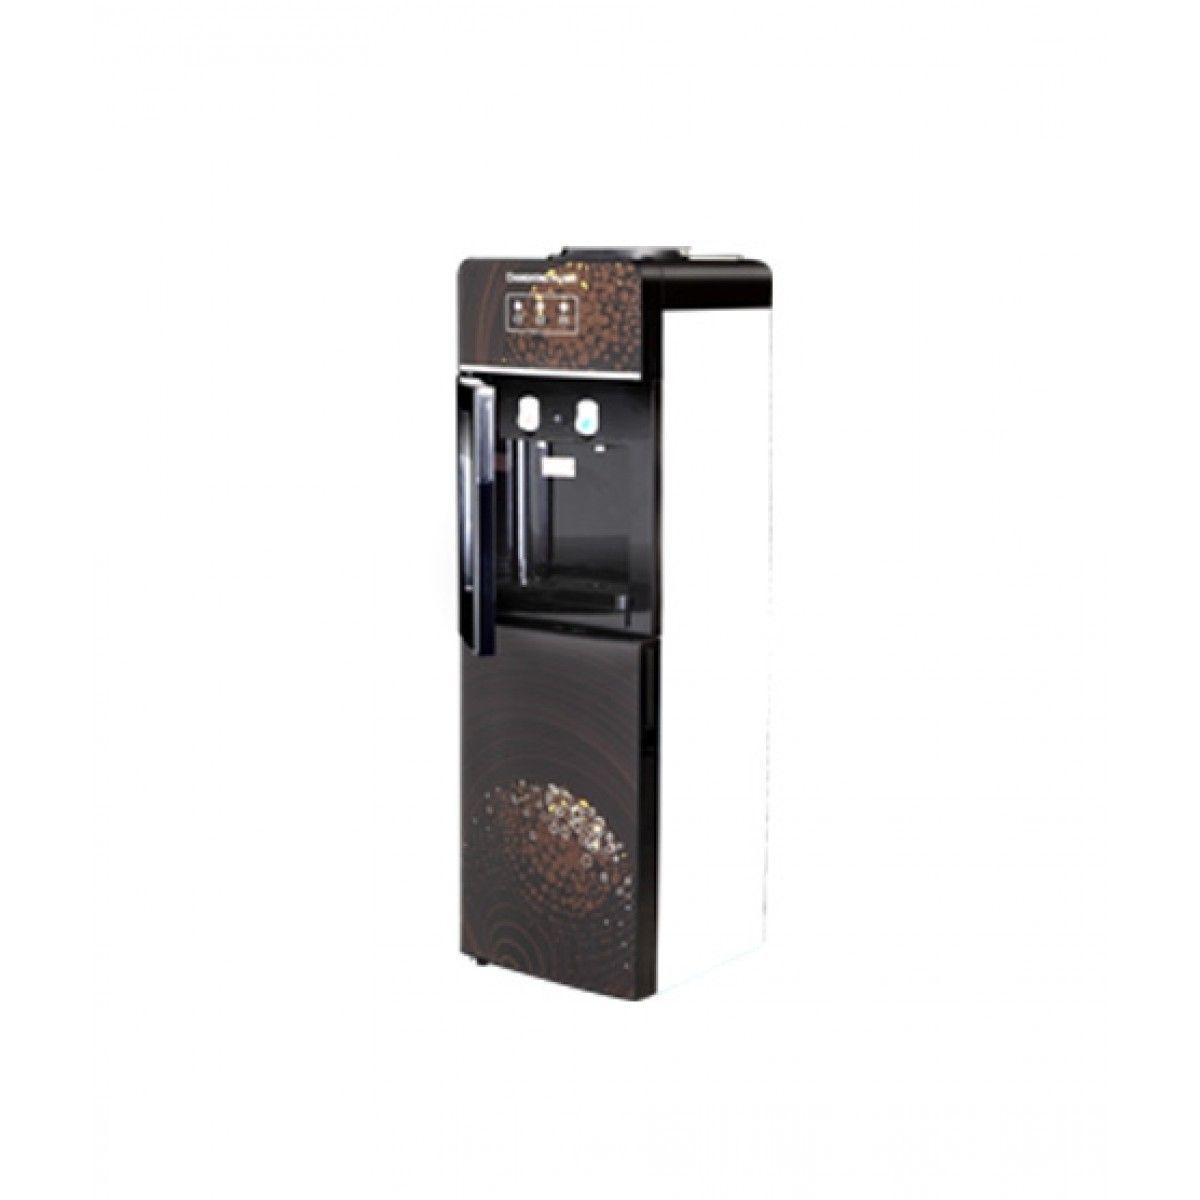 Changhong Ruba WD-CR66B Water Dispenser